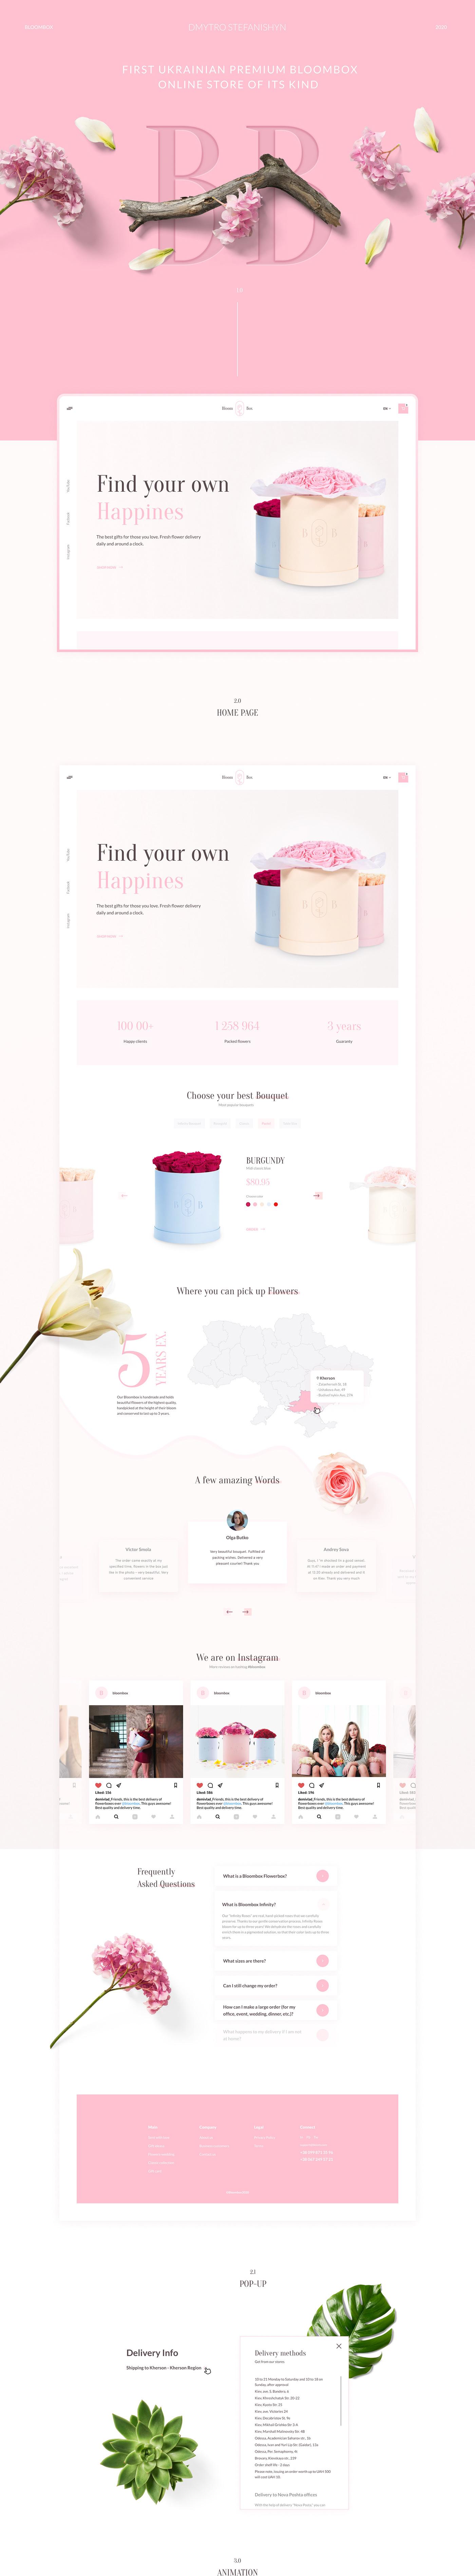 flower shop site clean minimal fullscreen ui ux delivery landing page Website